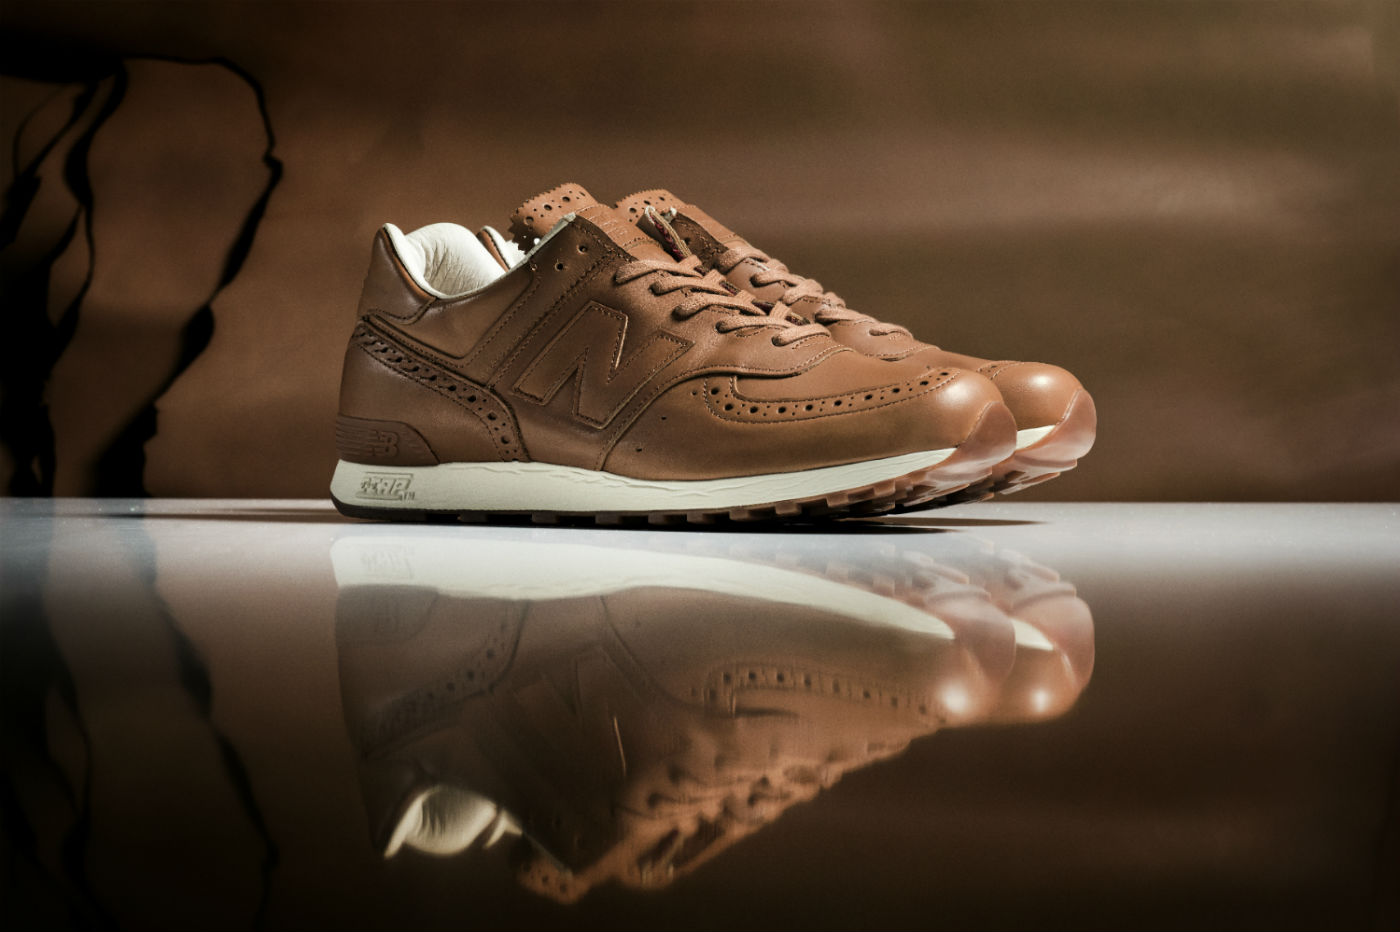 new balance x grenson brogue sneaker